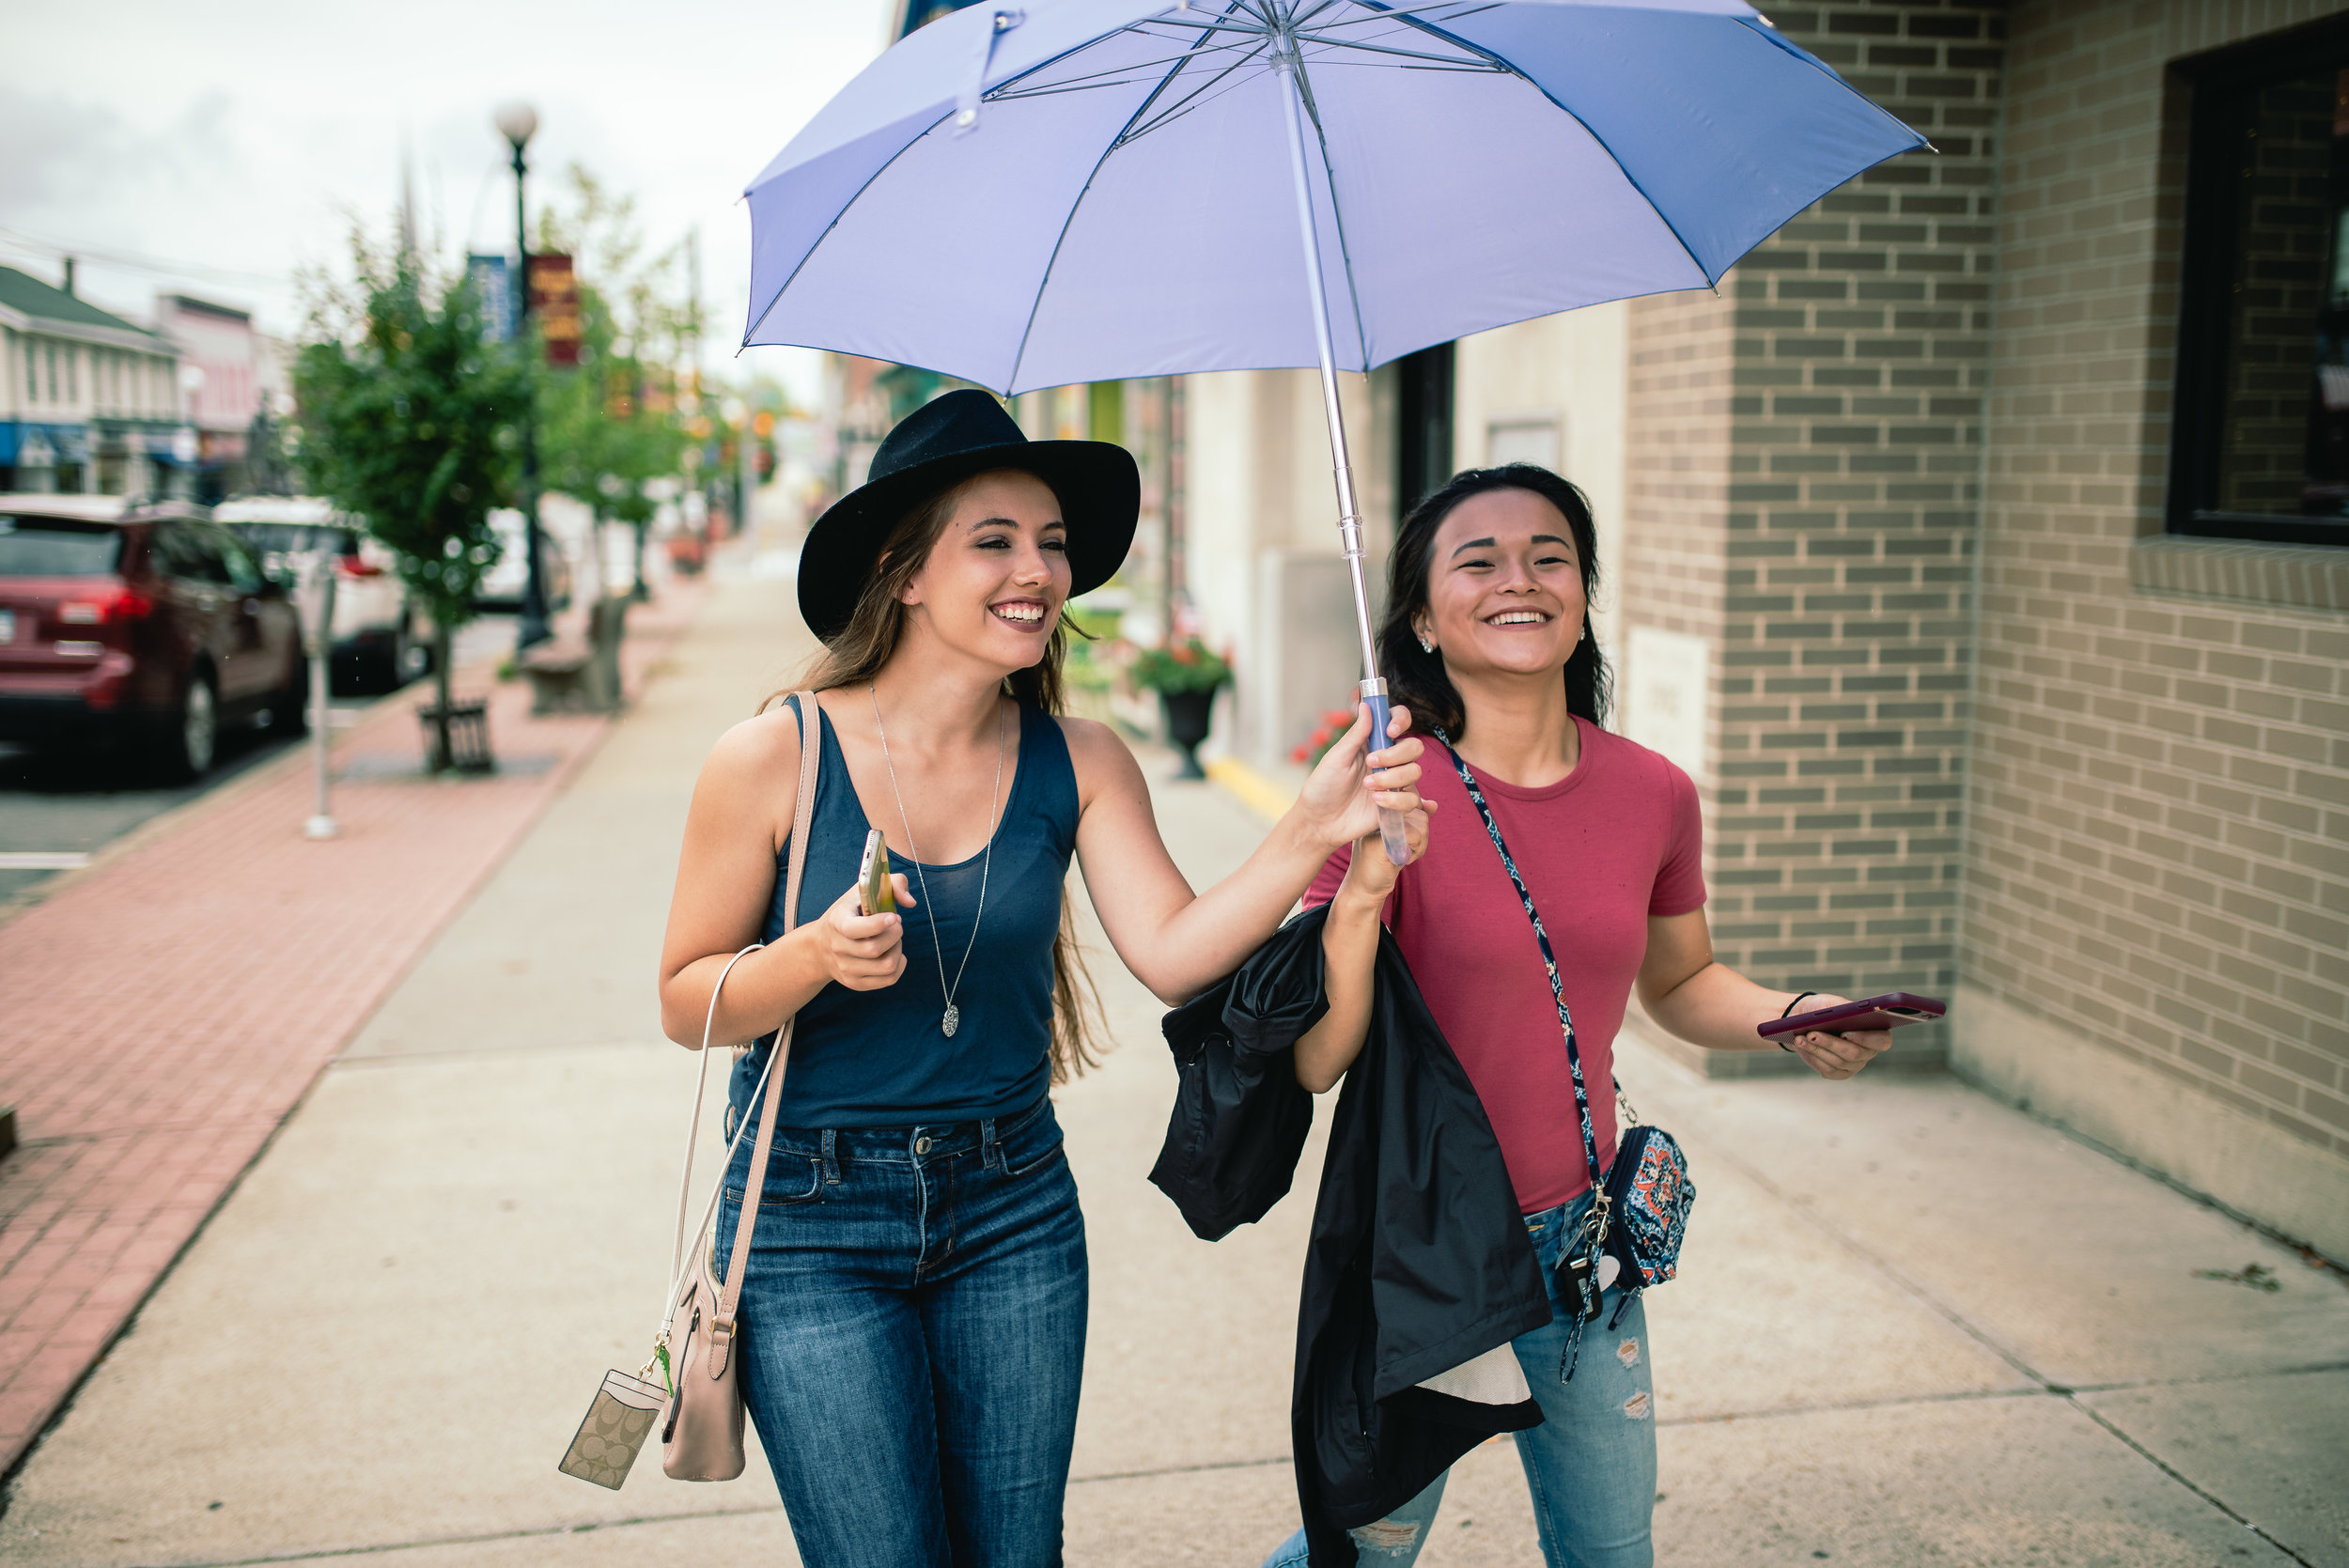 Models walking down main street Clarion PA